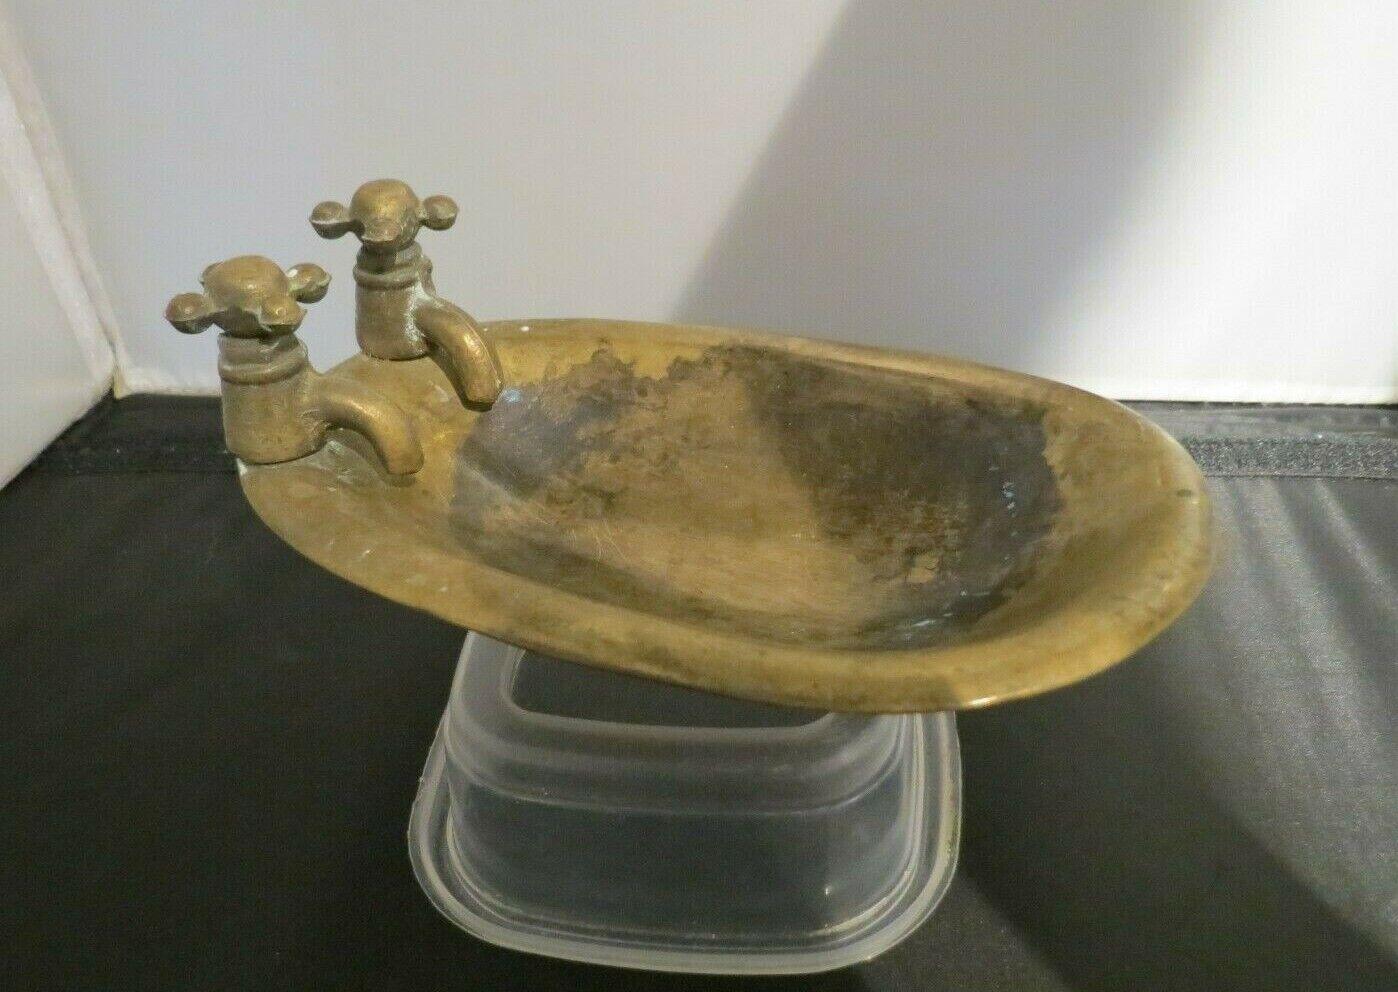 Vintage Brass Bath Tub With Taps Soap Dish Ornament